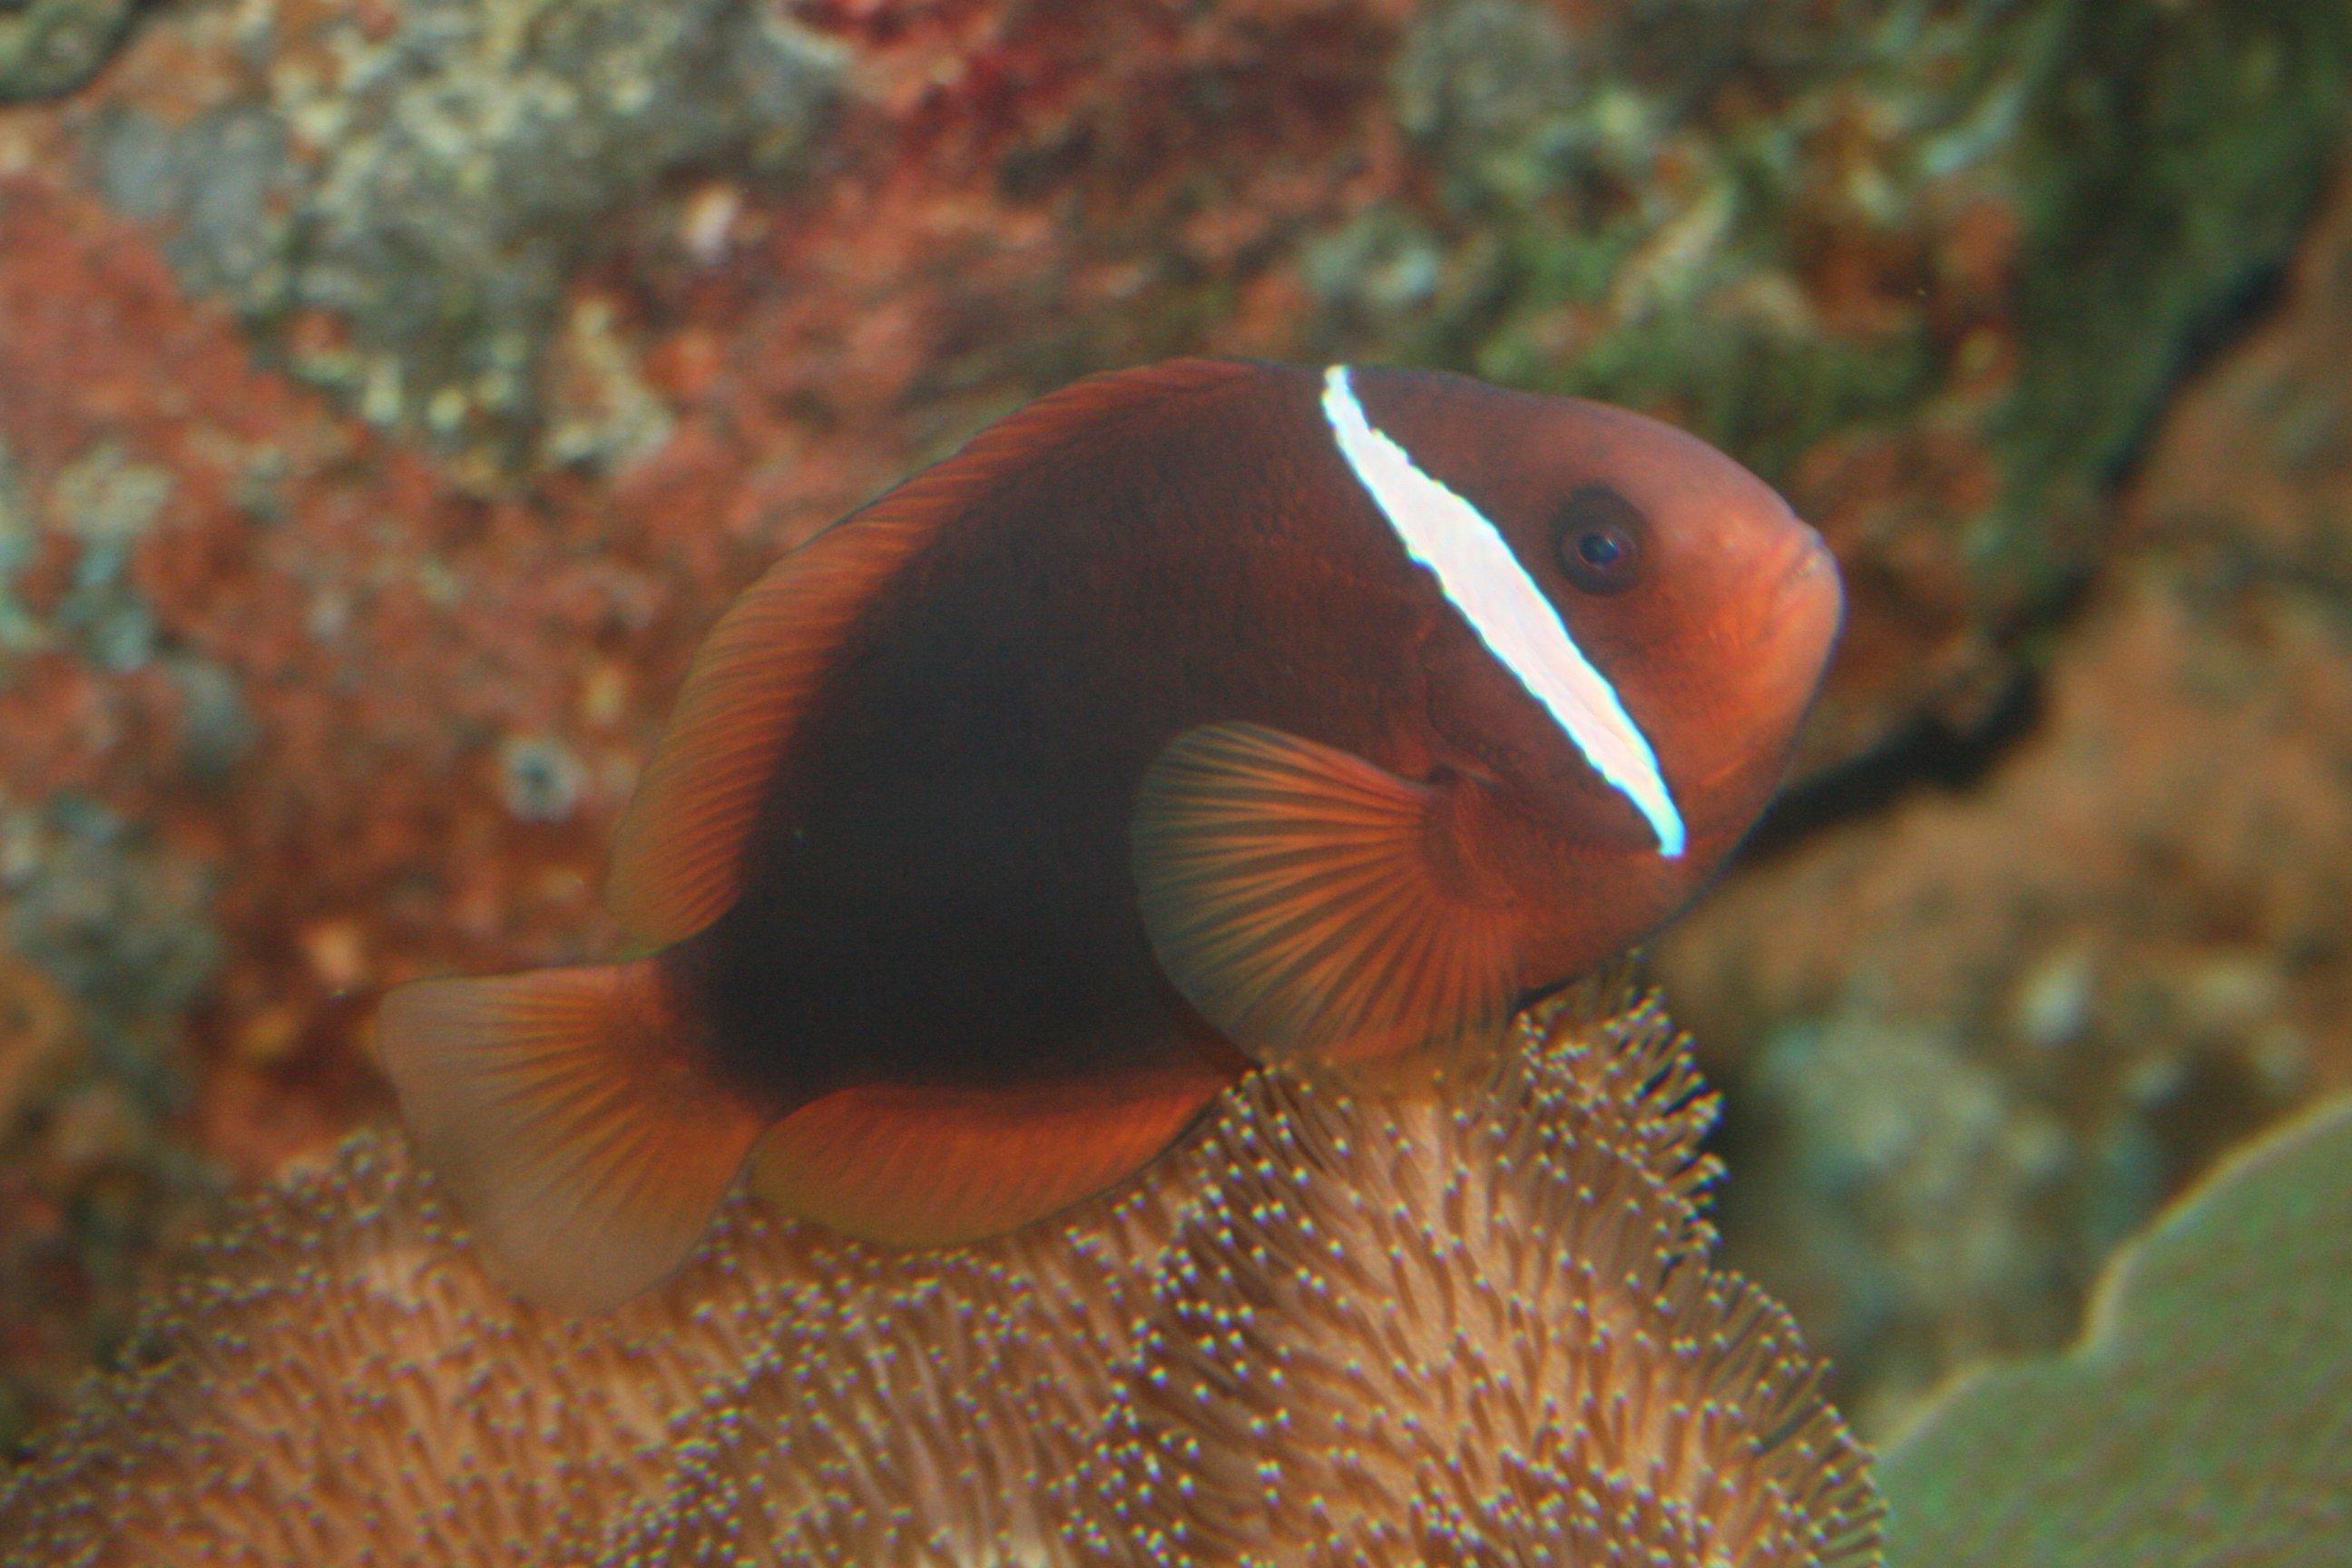 Clown fish - photo#27